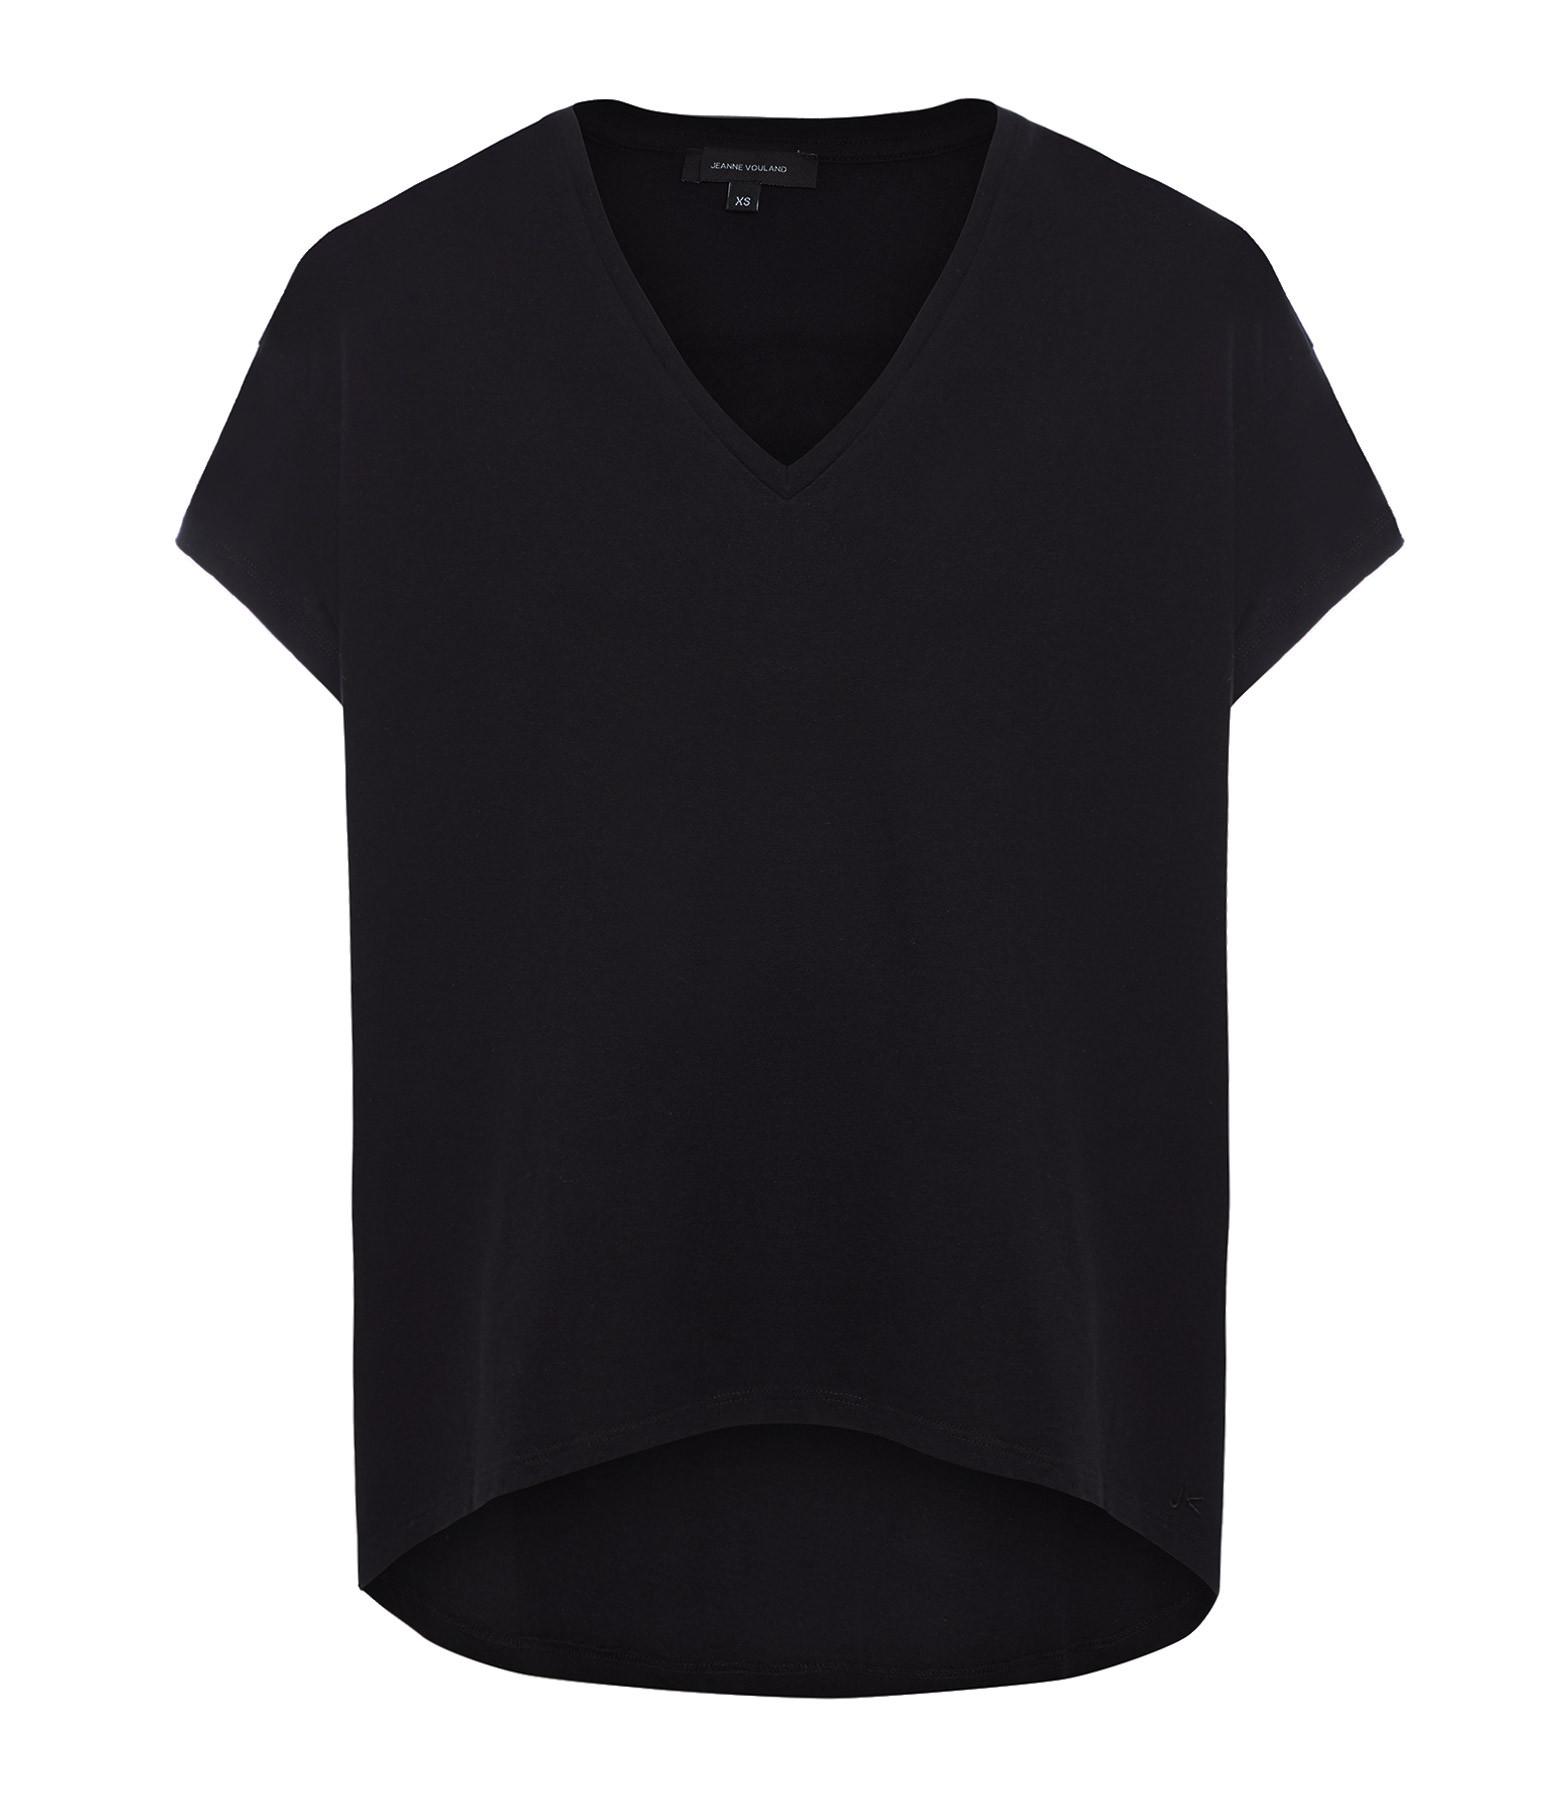 JEANNE VOULAND - Tee-shirt Bacha Coton Lin Noir